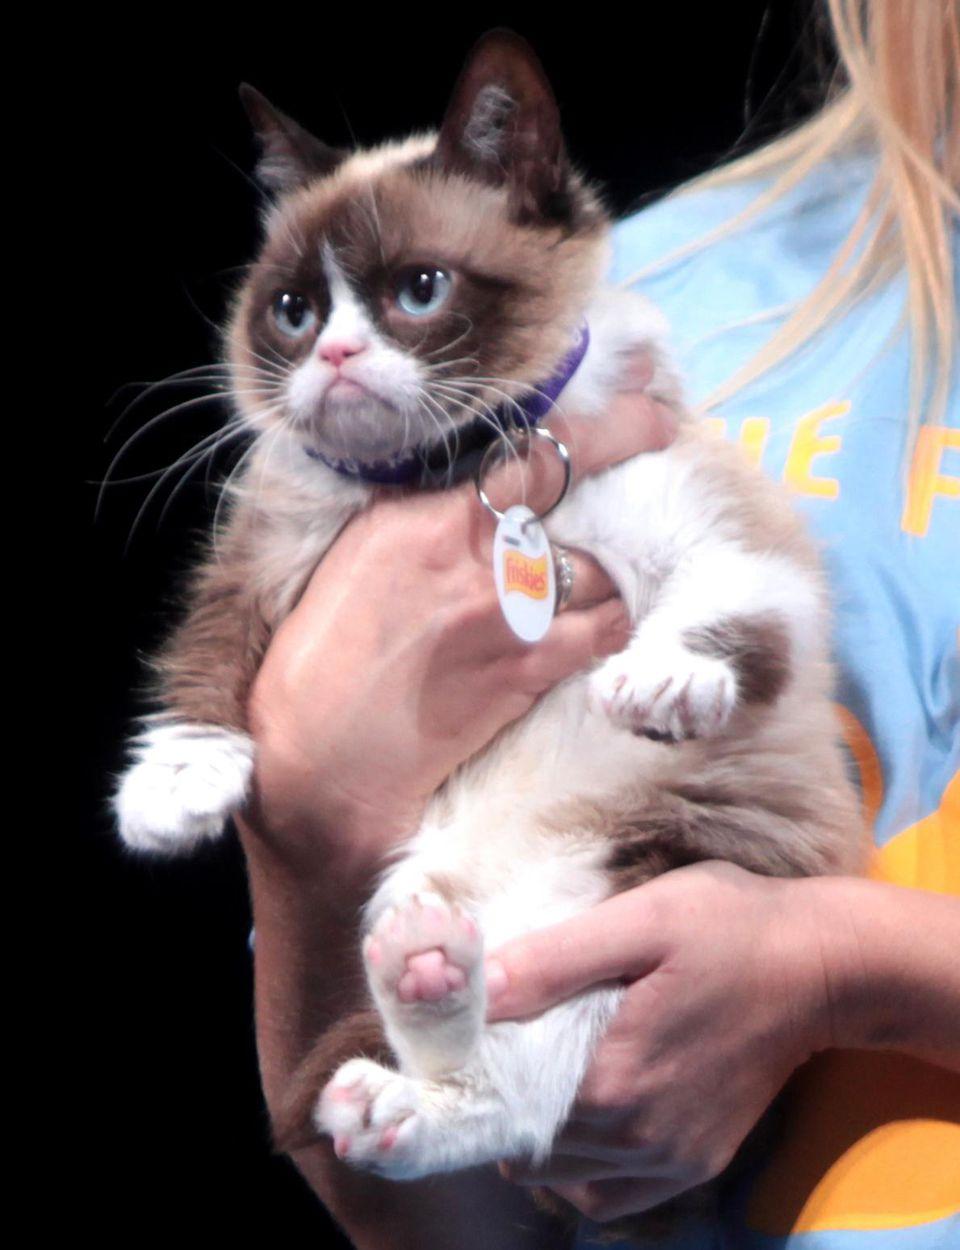 Grumpy Cat, GAGE SKIDMORE